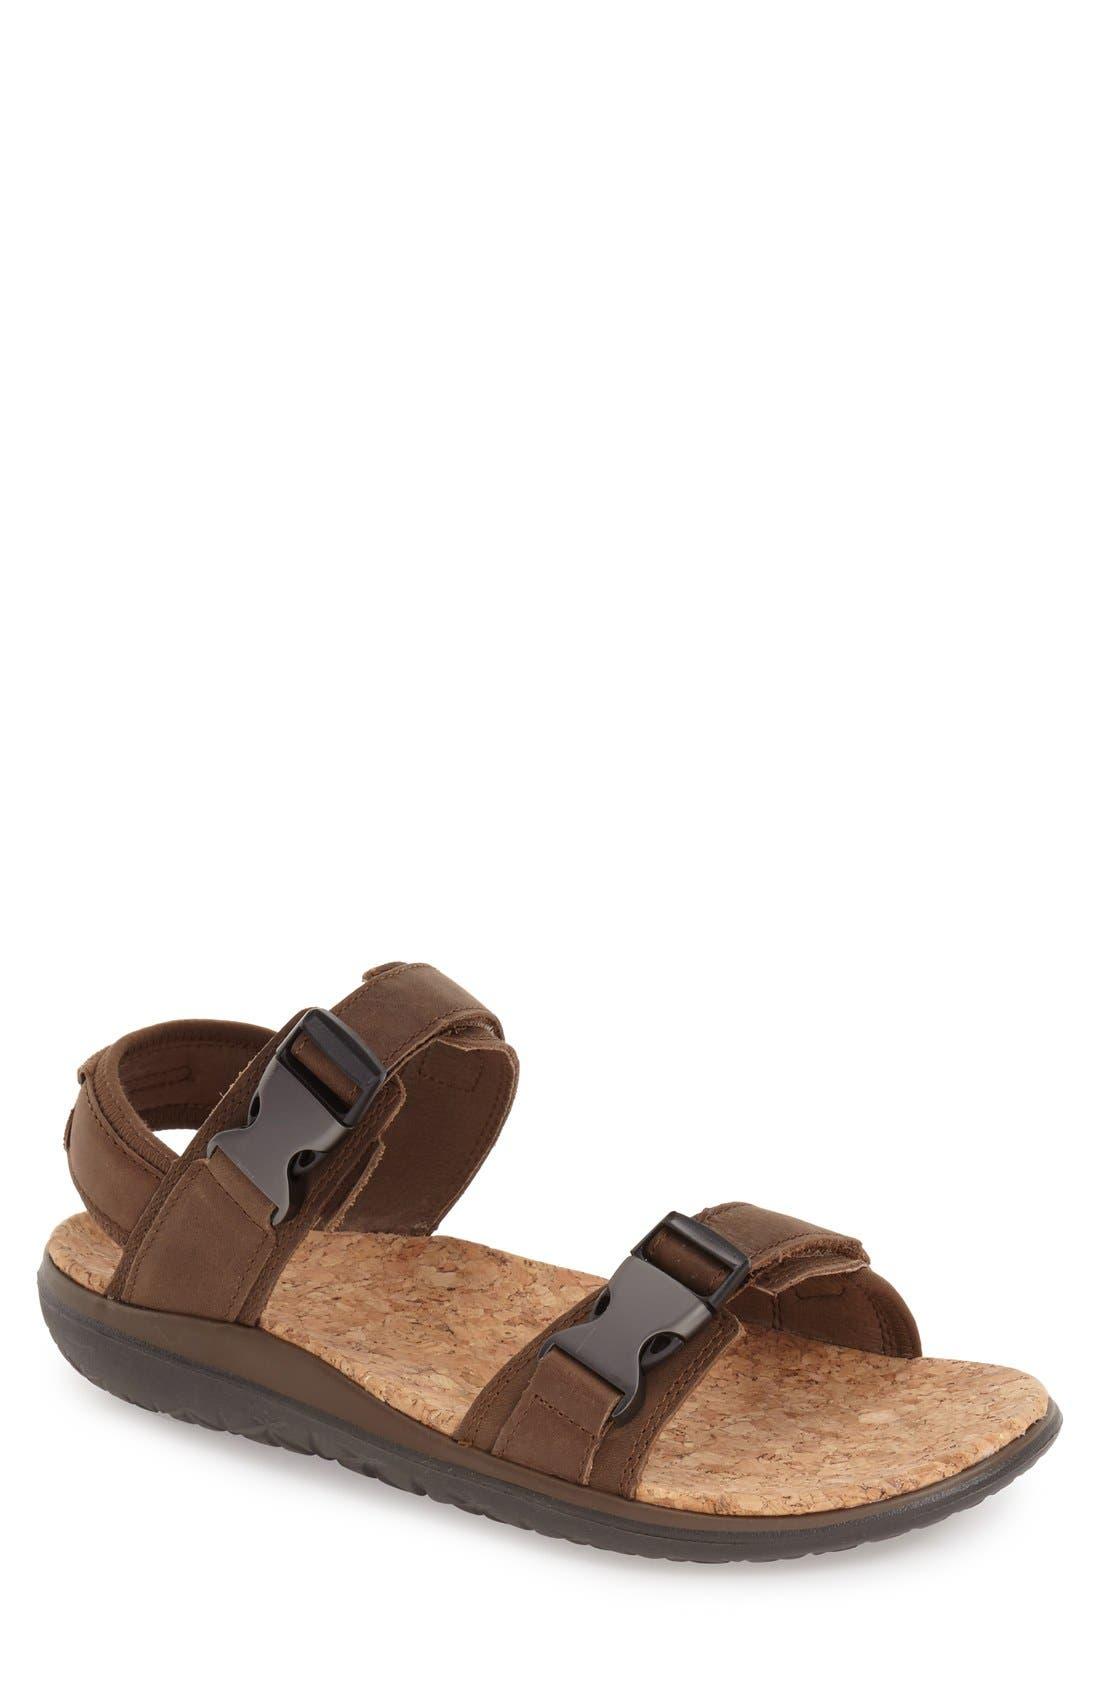 d5b508a1c Teva  Terra-Float Universal Lux  Sport Sandal In Brown